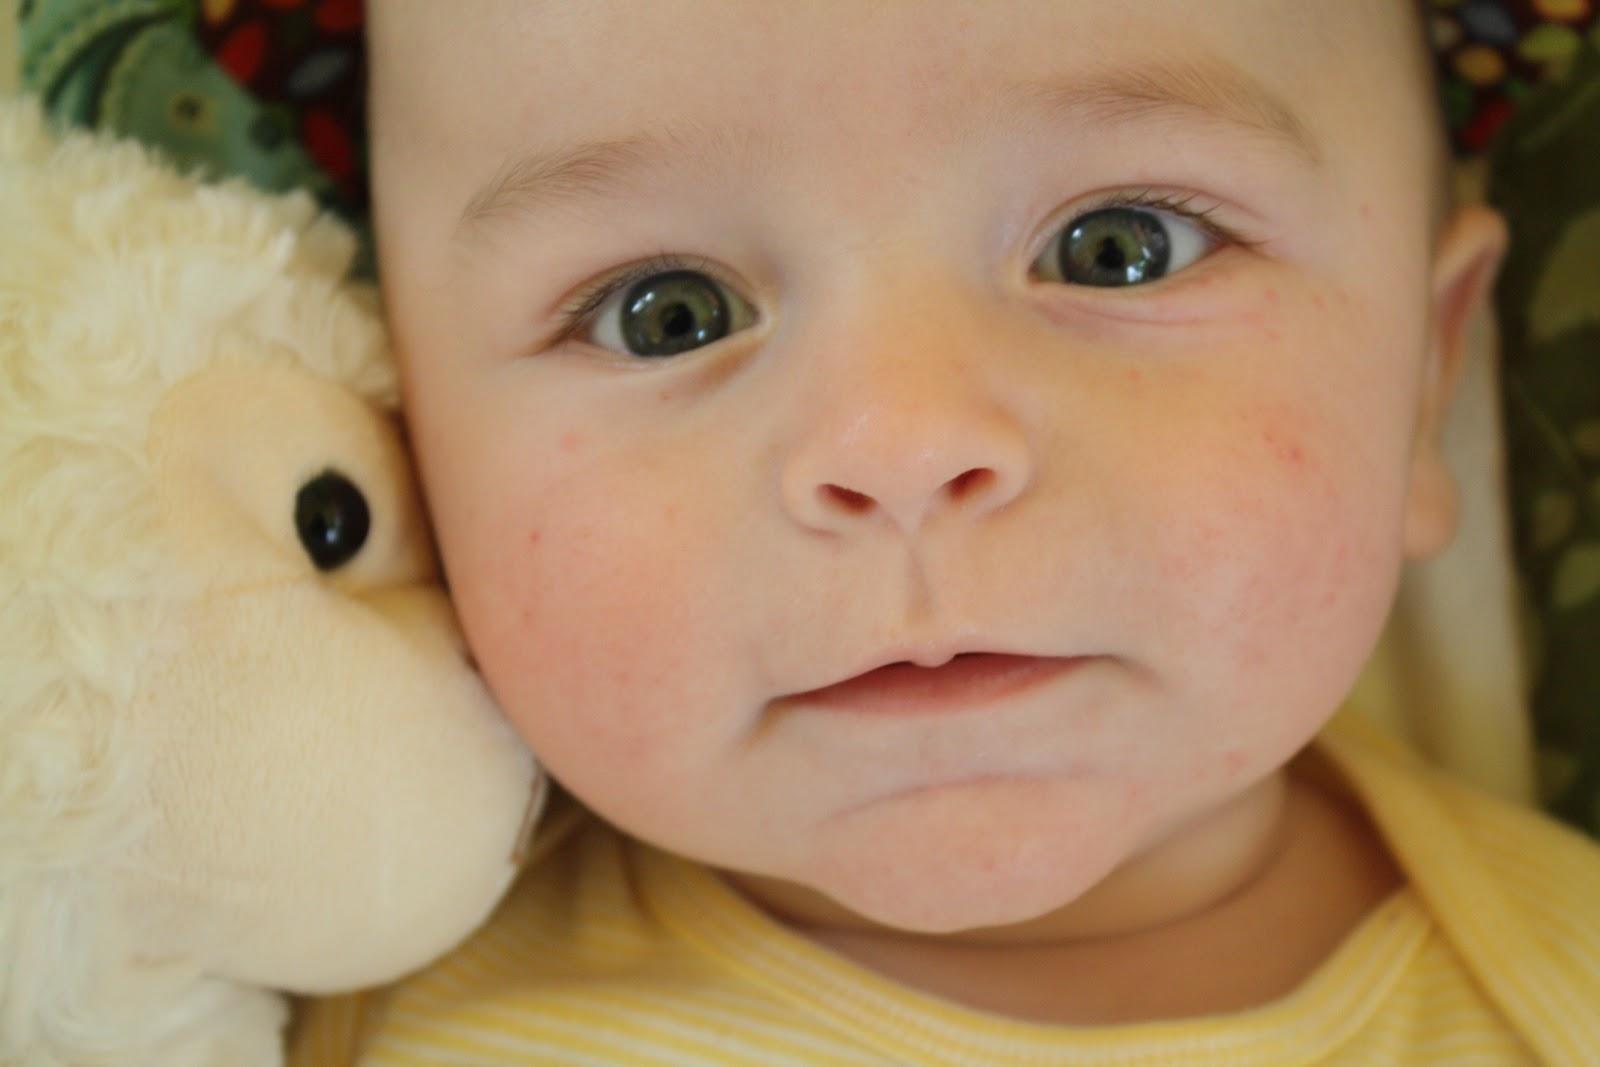 Cute Baby Boy With Green Eyes Tumblr   www.pixshark.com ...